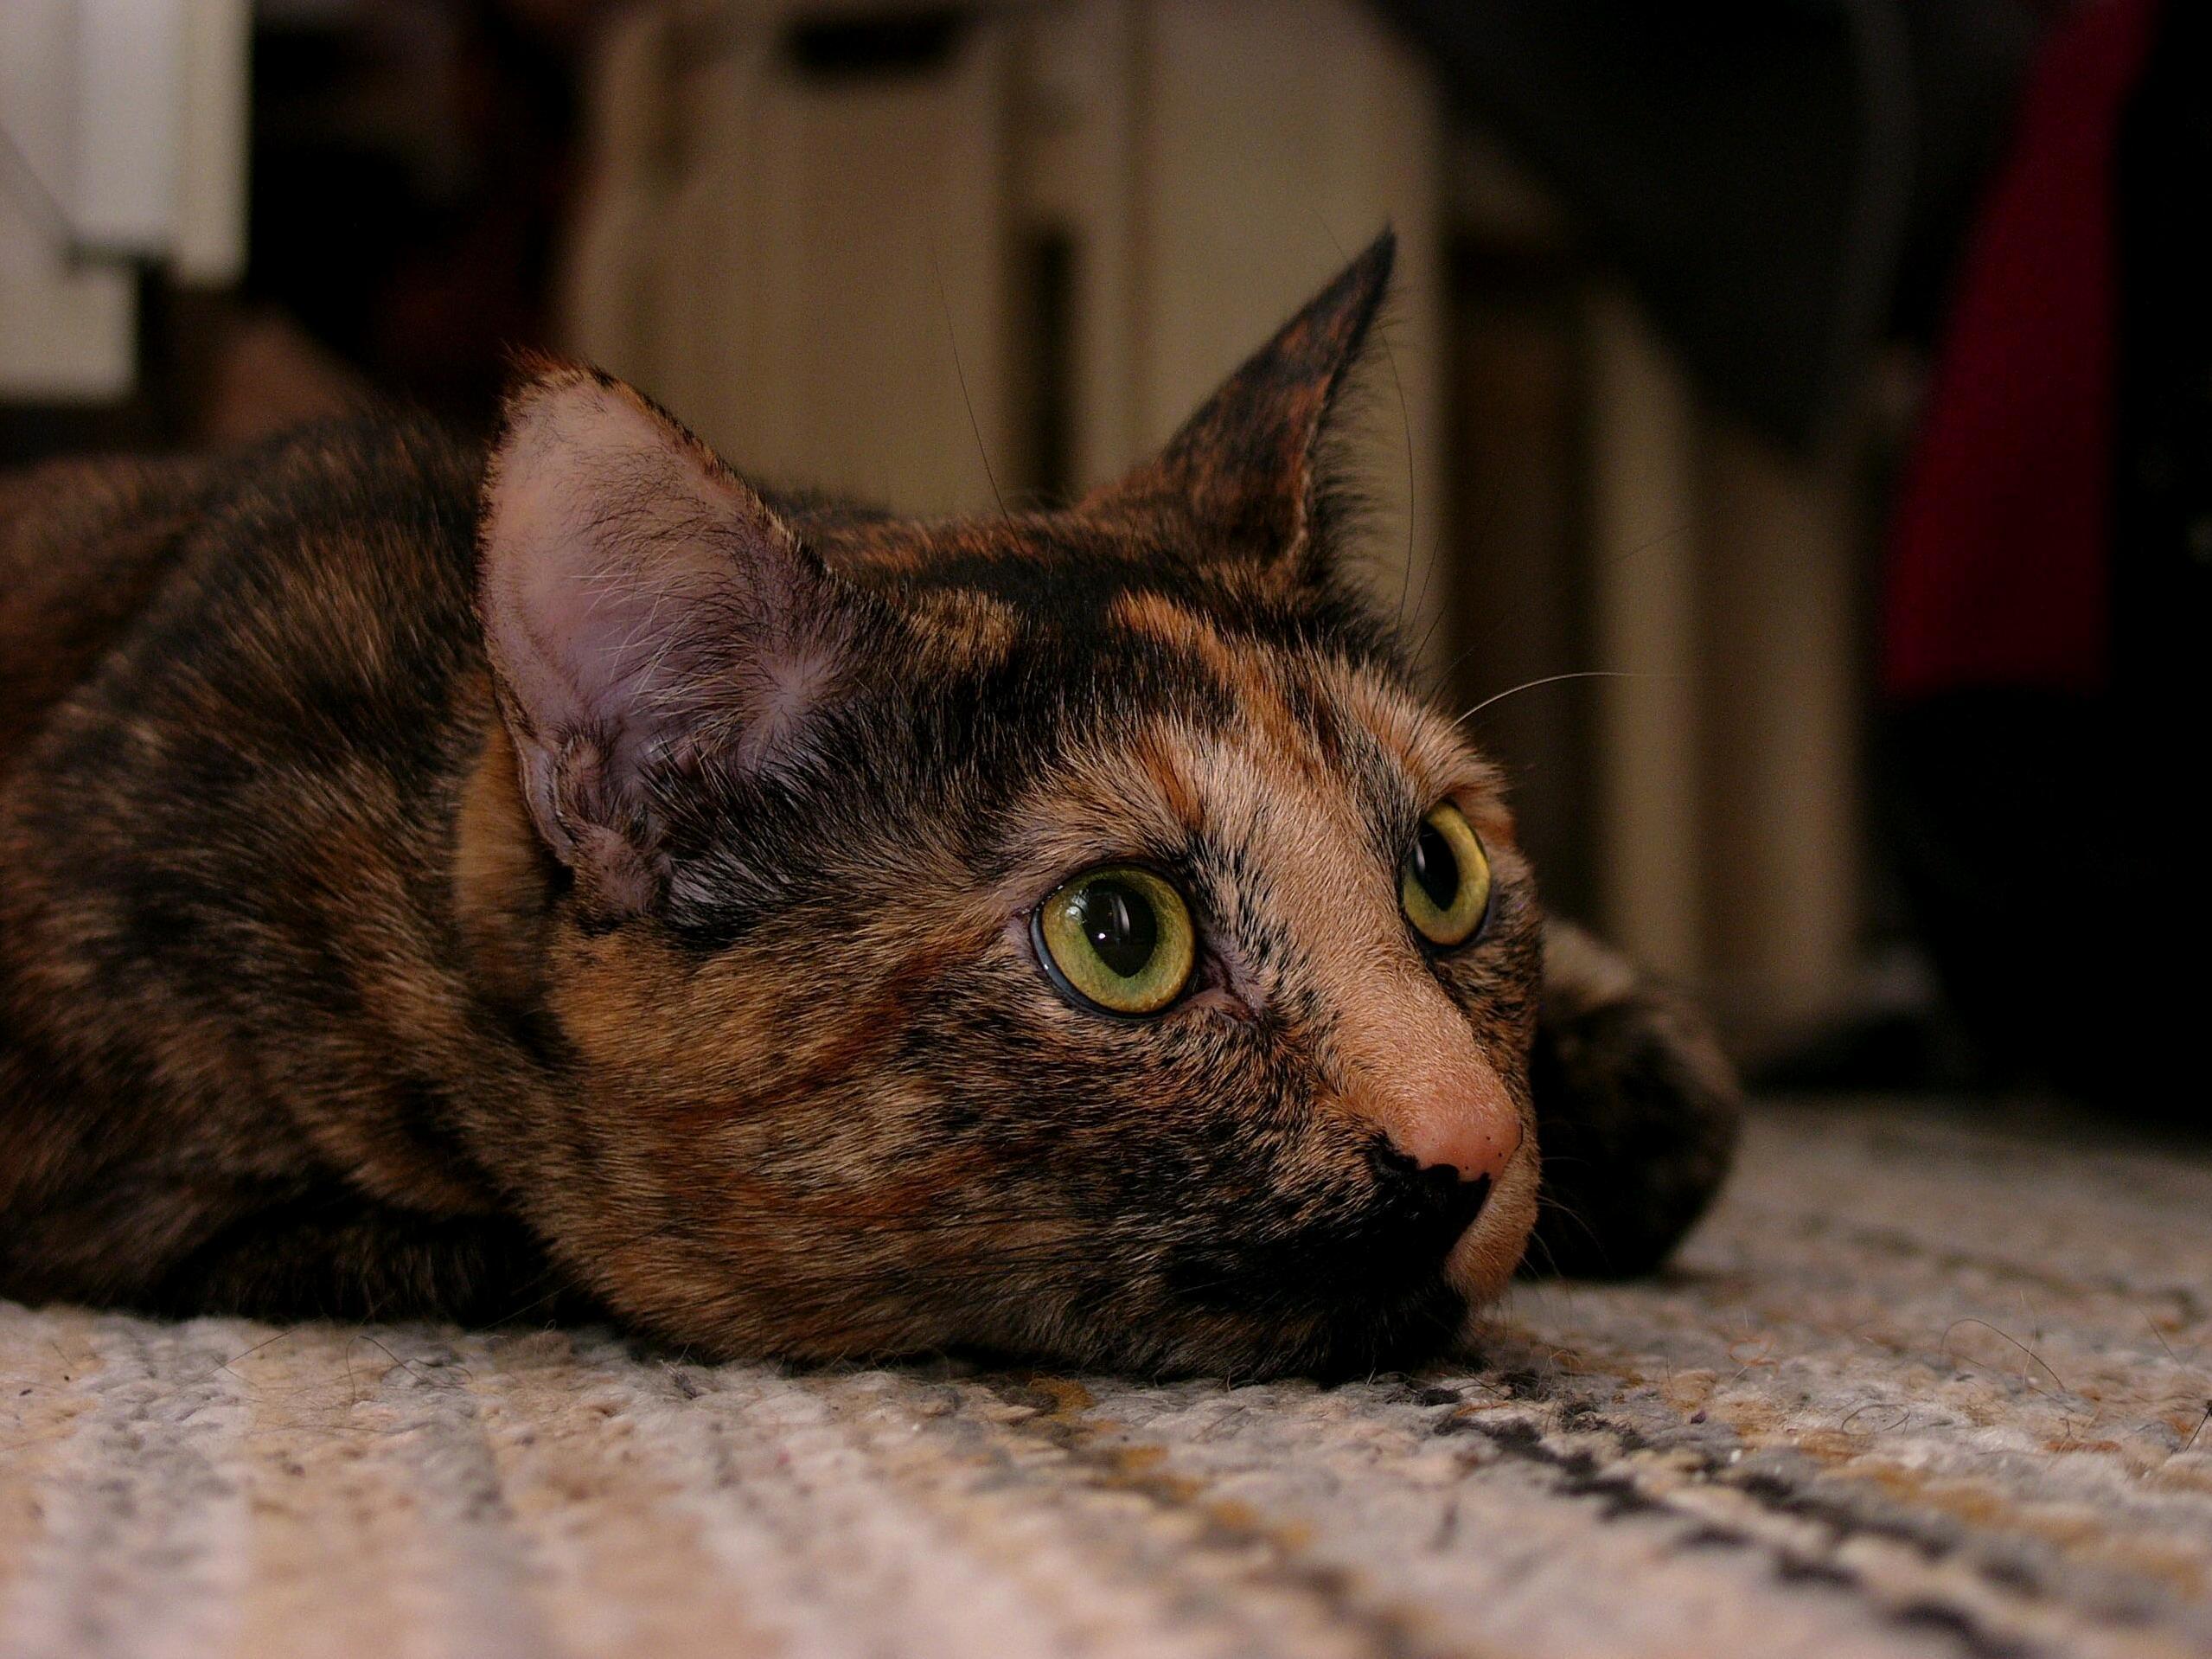 New camera, same great cat.